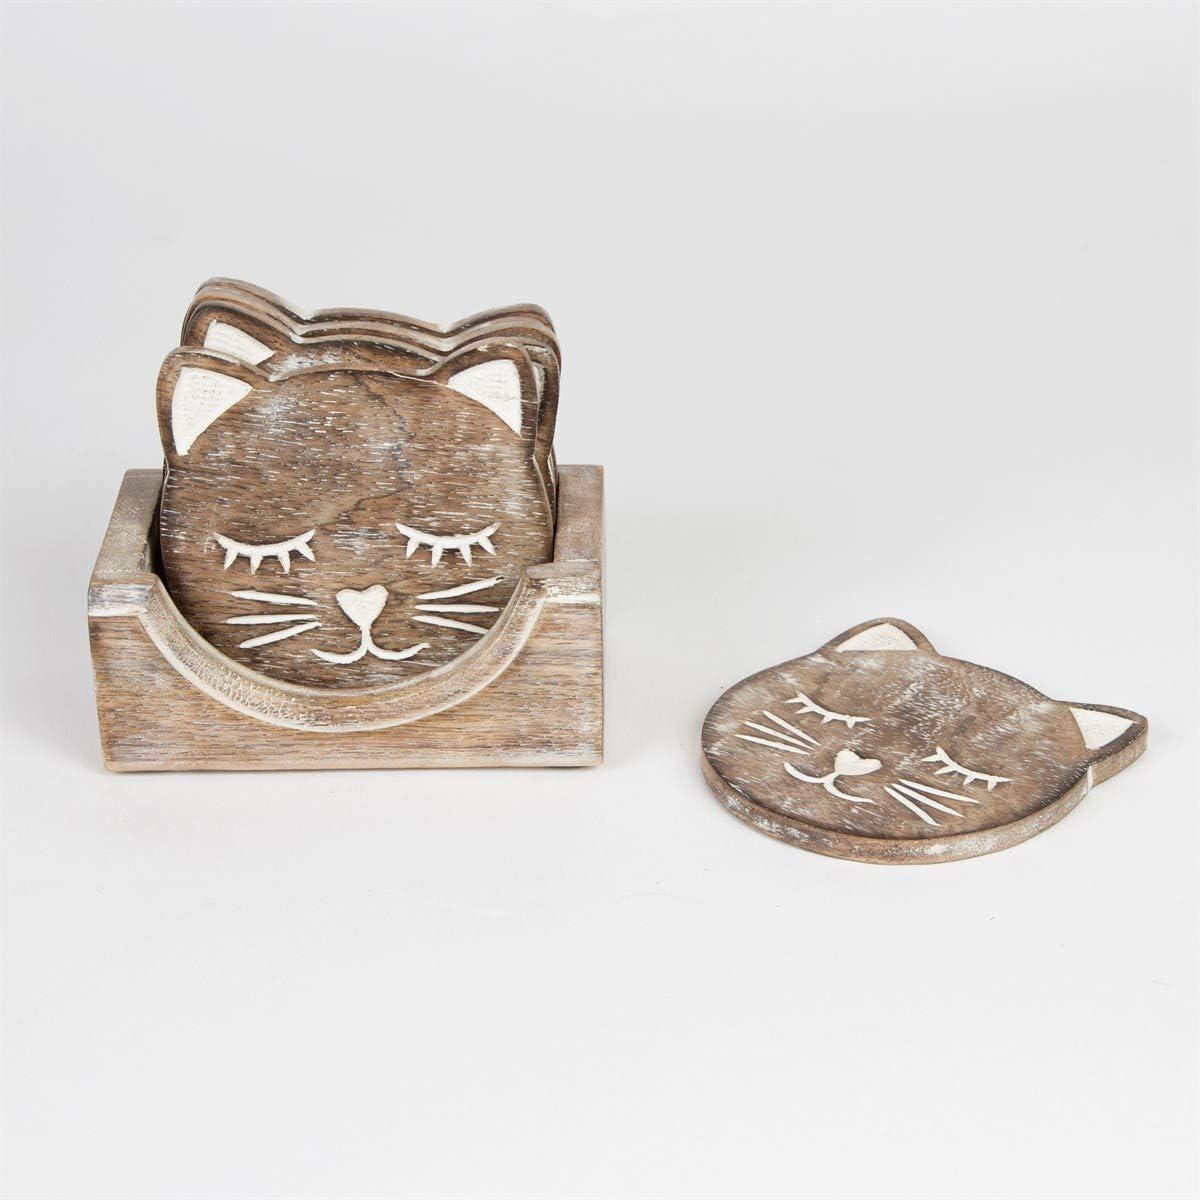 vino t/è gatto caff/è birra sottobicchiere tazze Indus Lifespace Sottobicchieri in legno per bevande